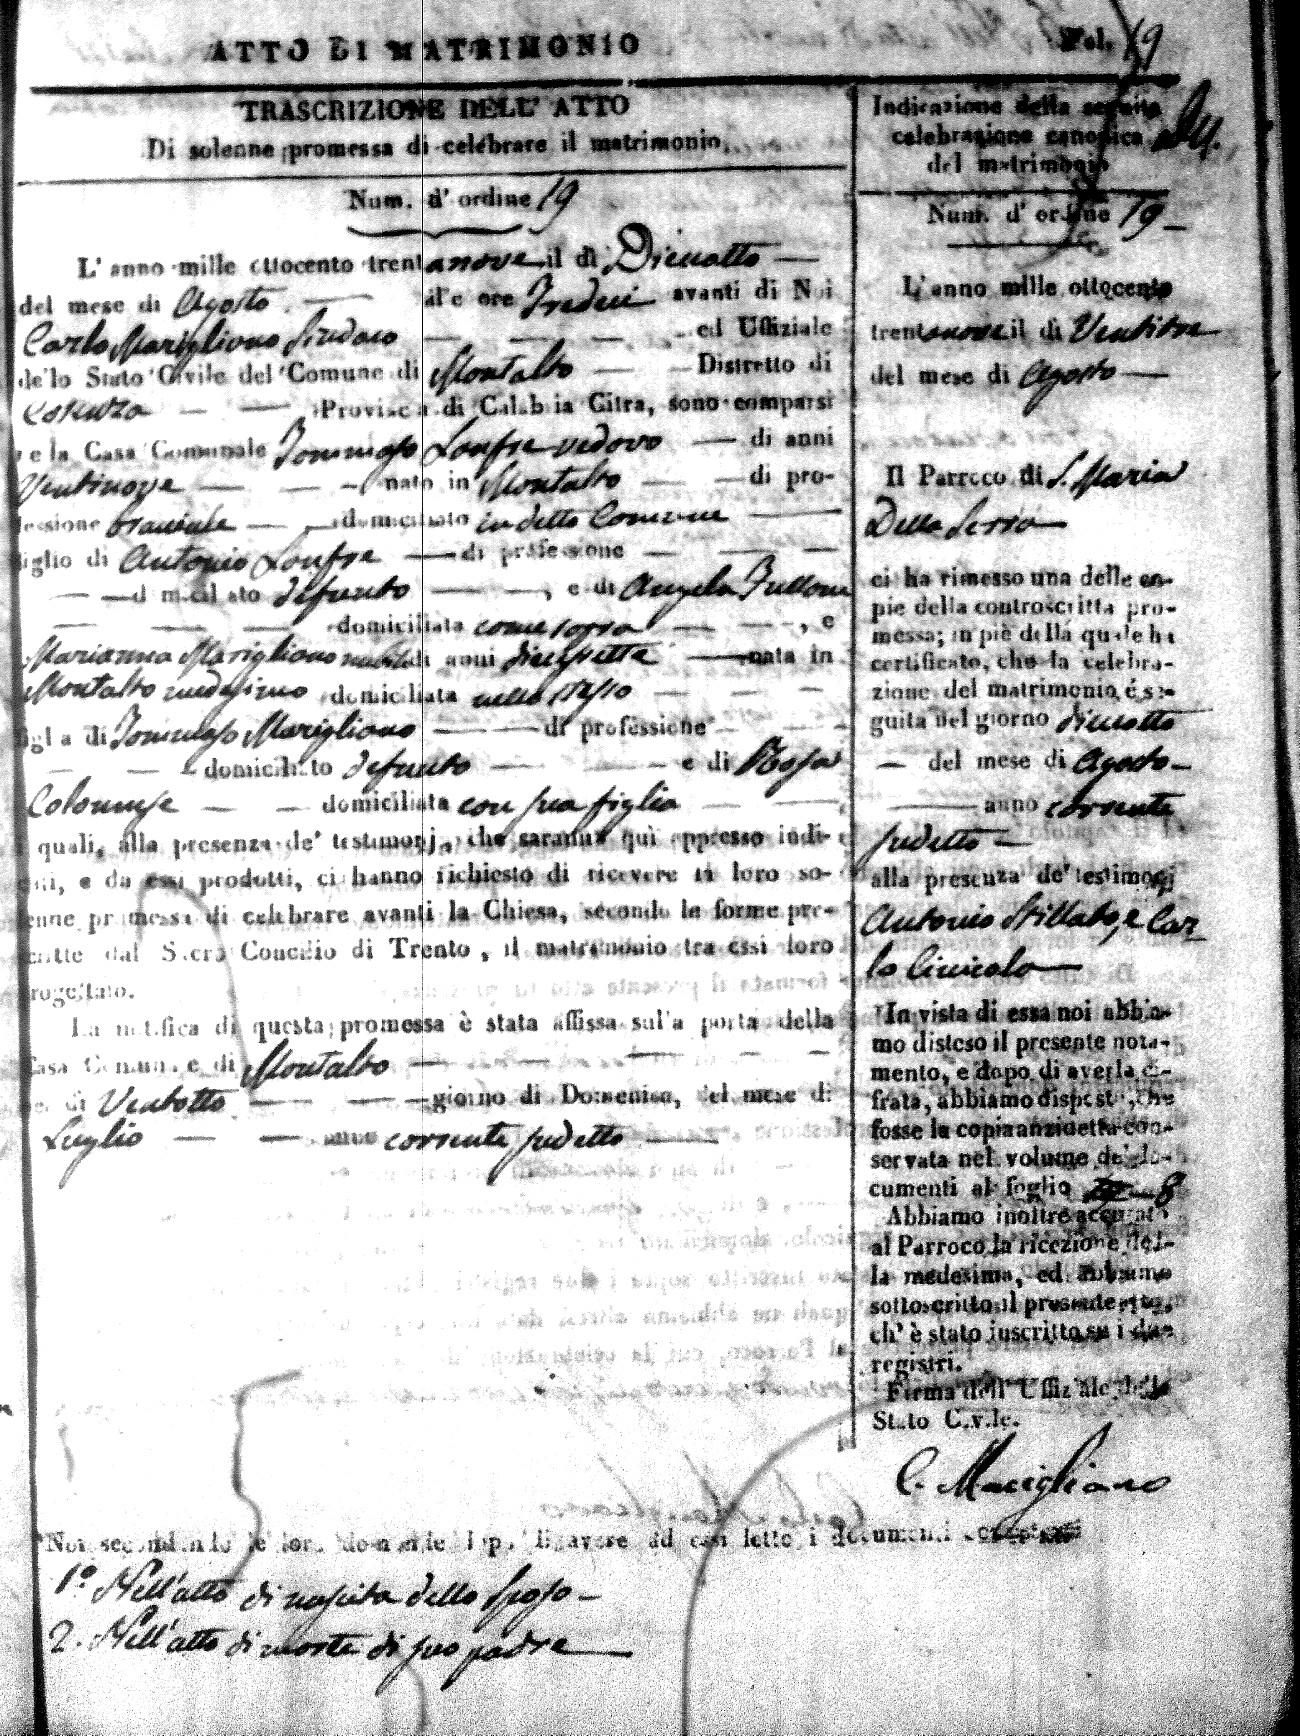 Matrimonio Pasquale Romano : The cosenza exchange montalto uffugo matrimonio